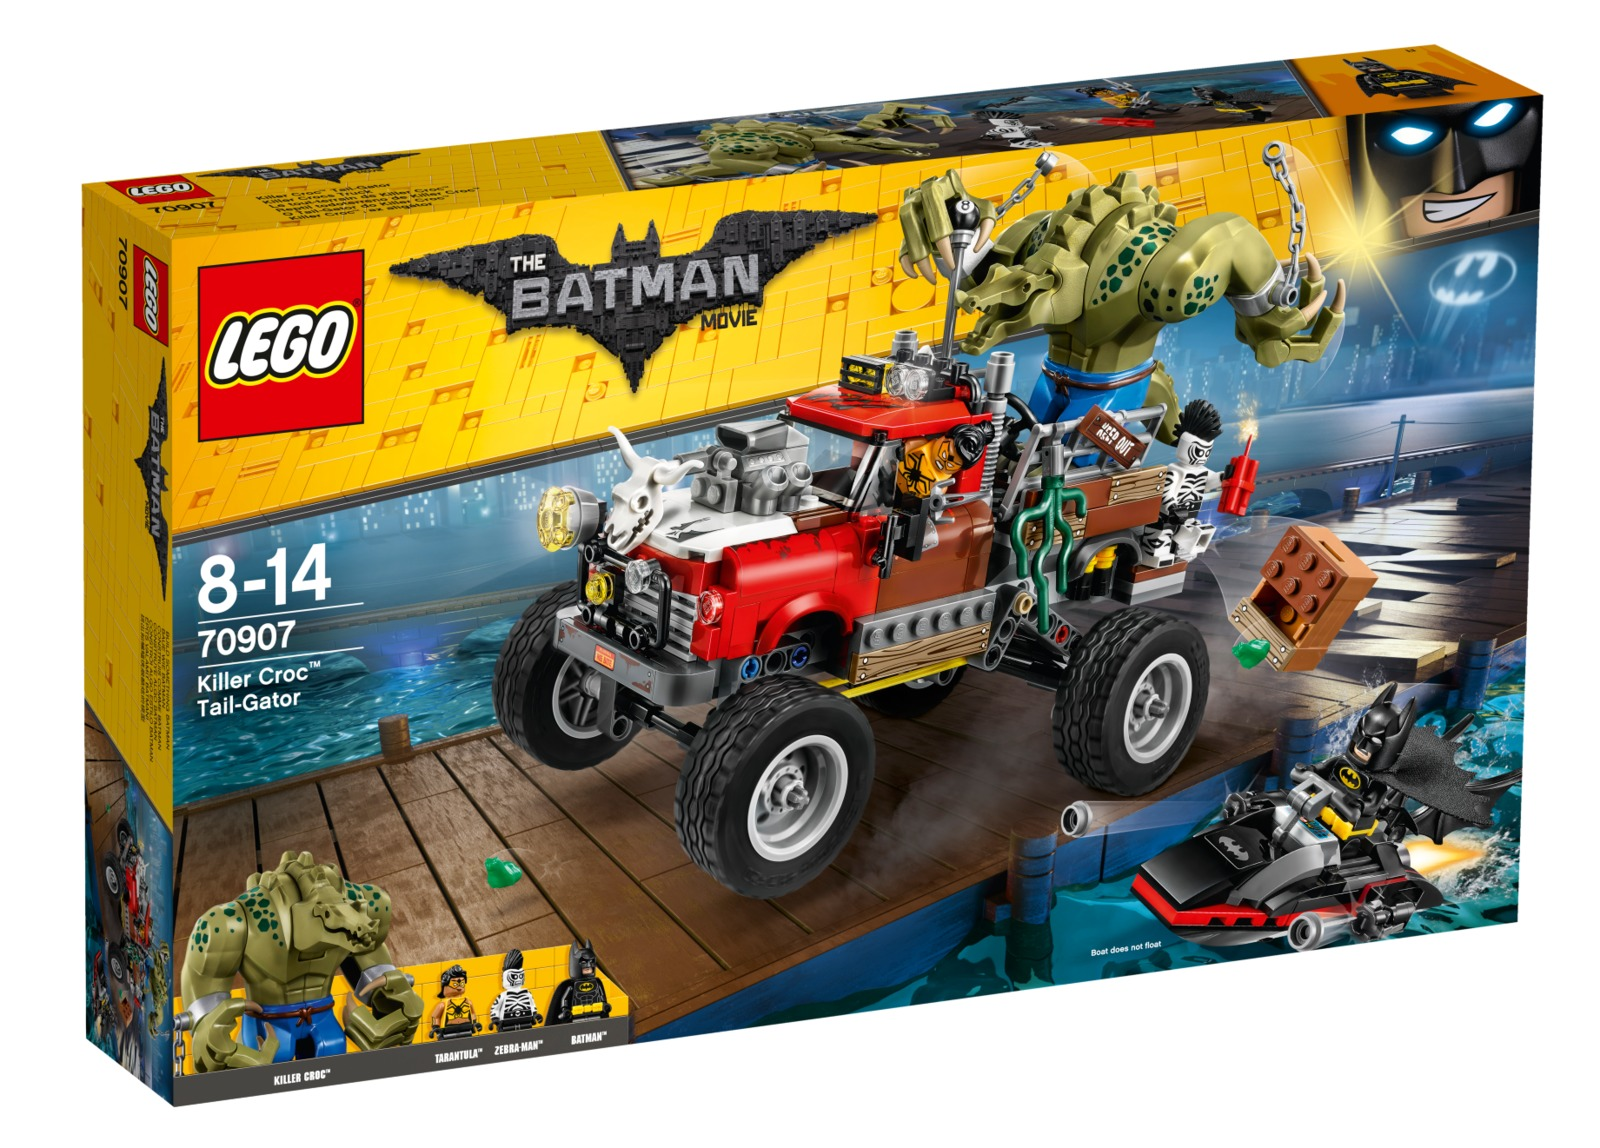 LEGO Batman Movie: Killer Croc Tail-Gator (70907) image